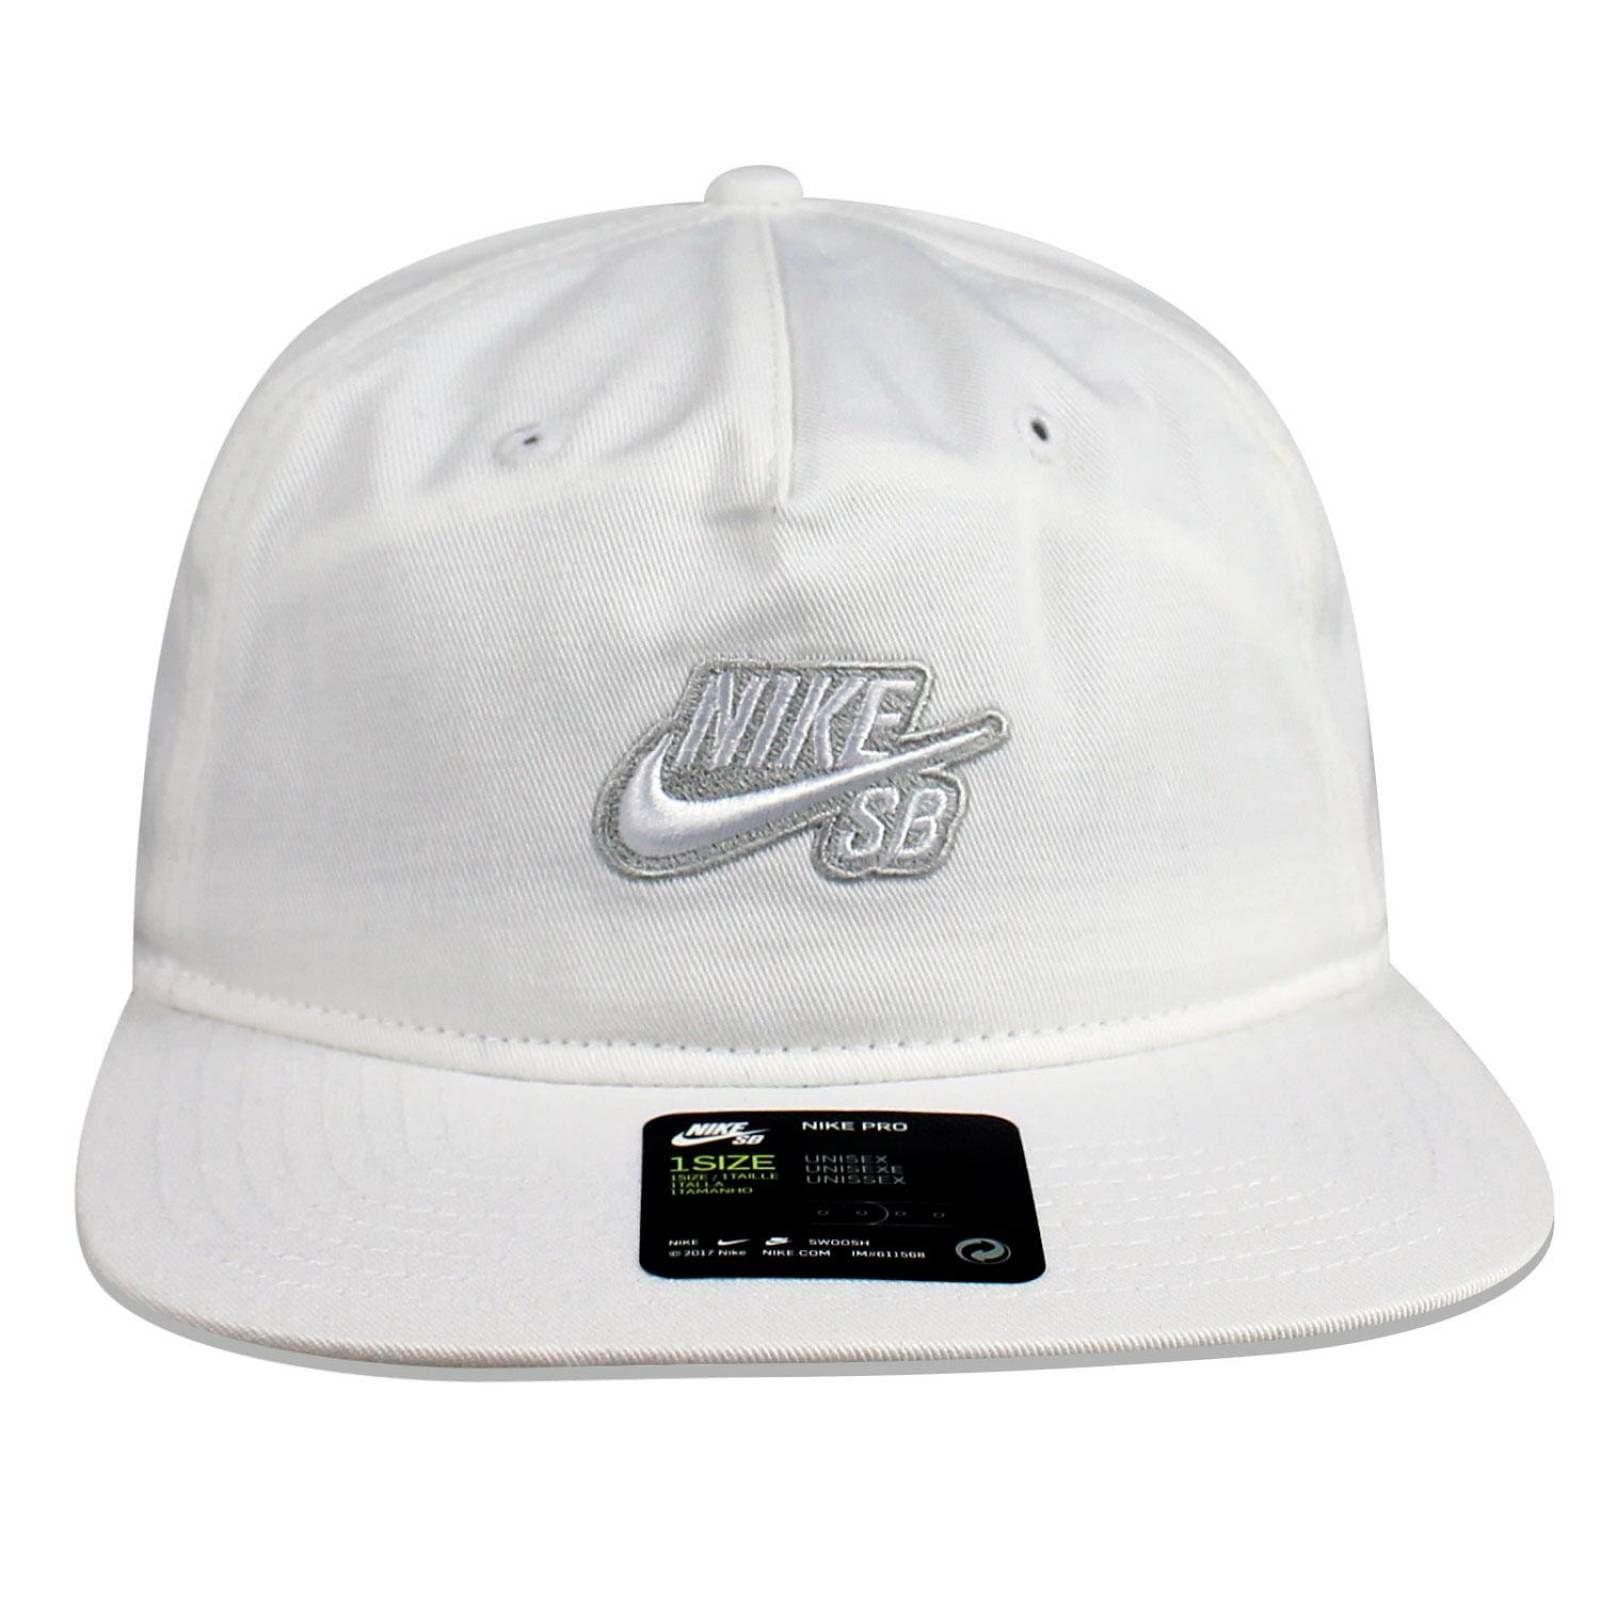 Gorra Nike Snapback Skateboarding Blanca